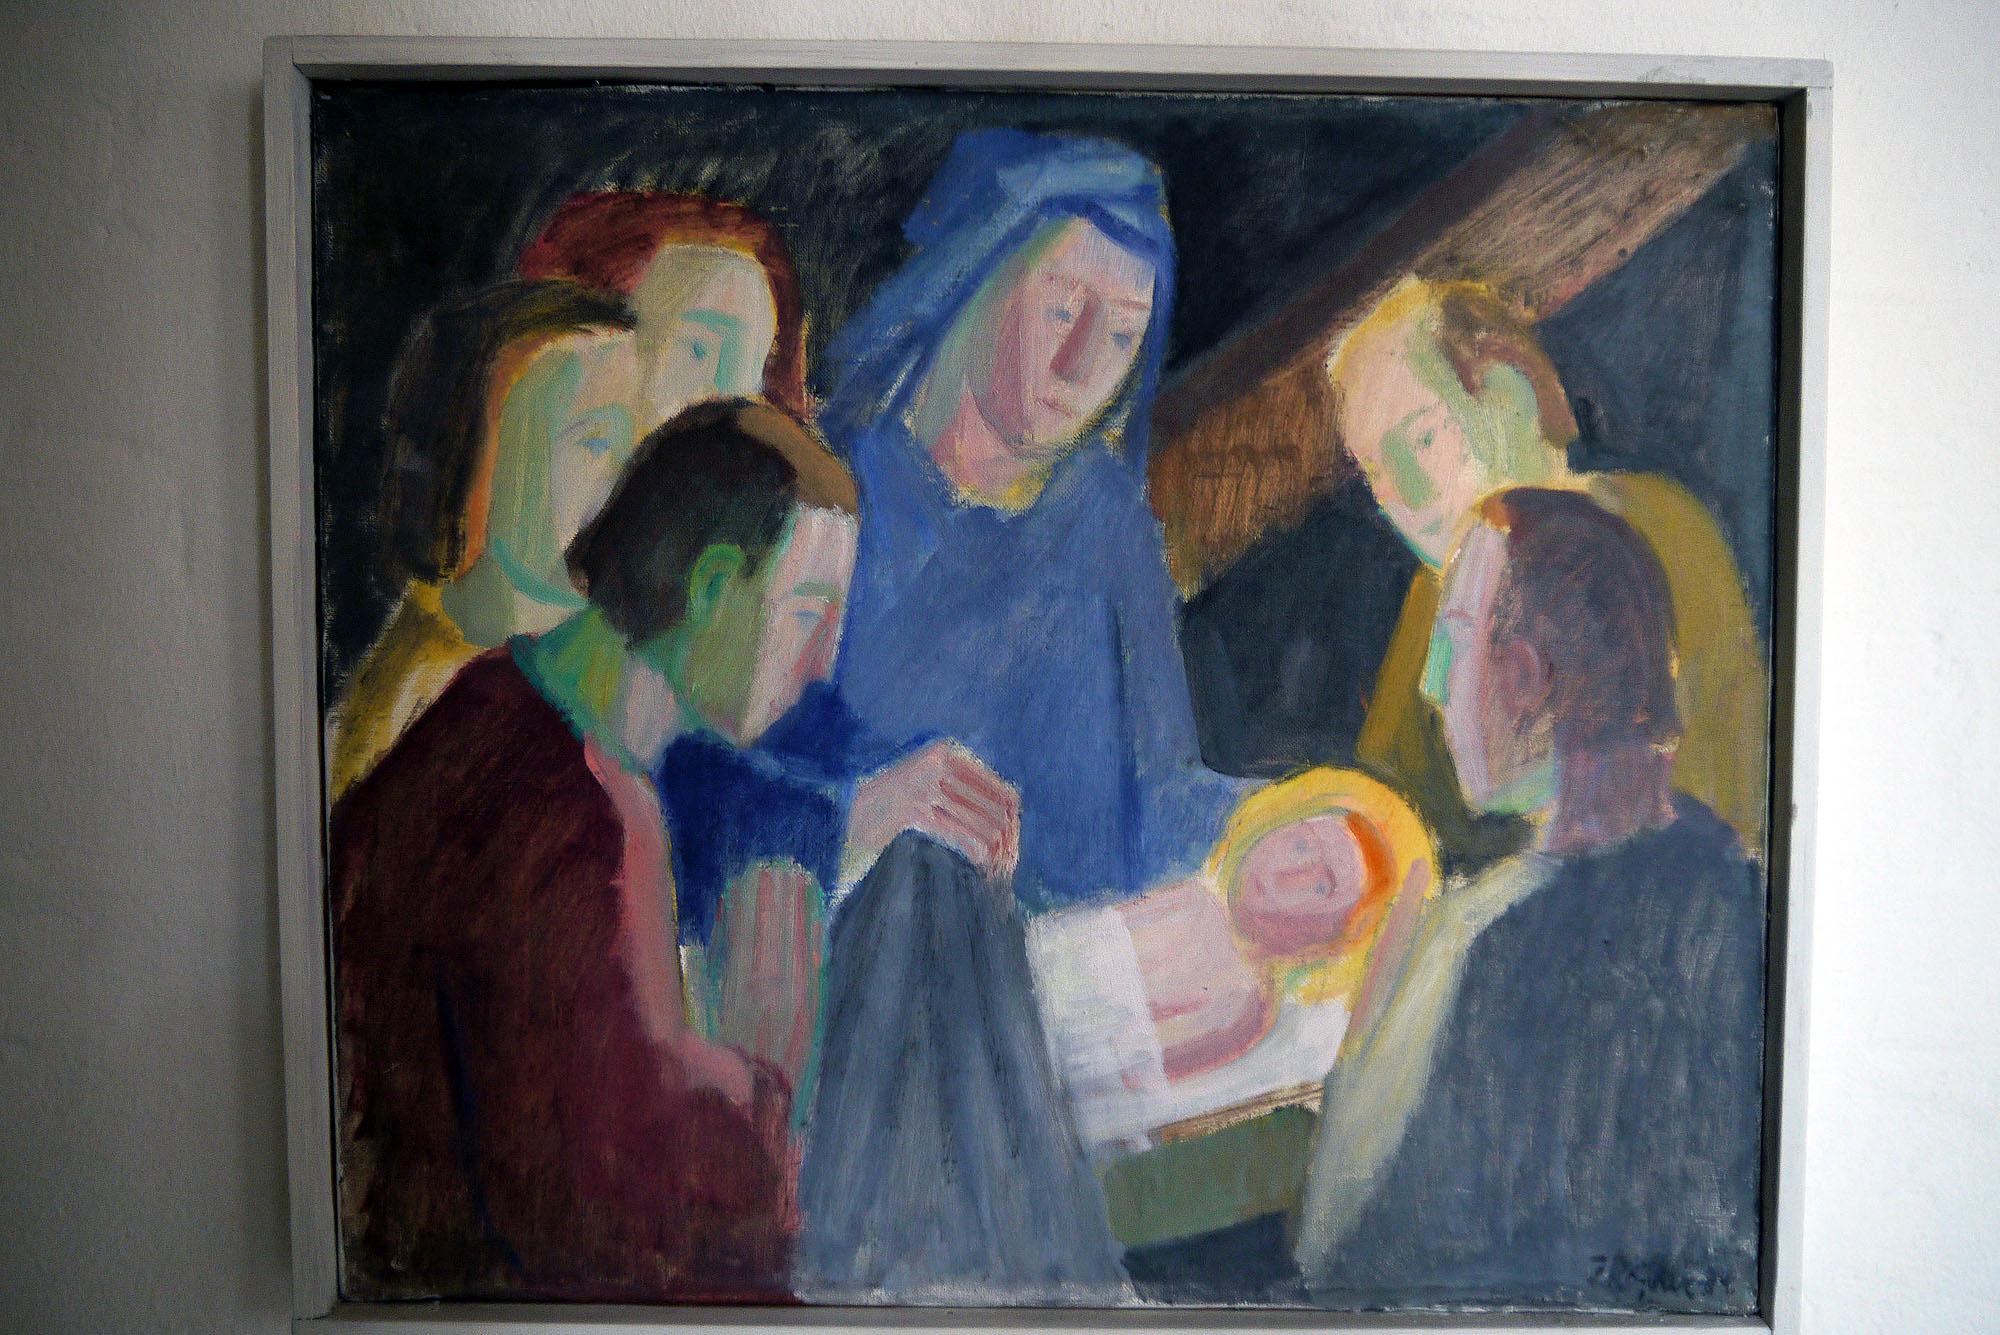 Ingolf Røjbækmåske Messiaskirkenmåske Helsingør_Messias-1926_21